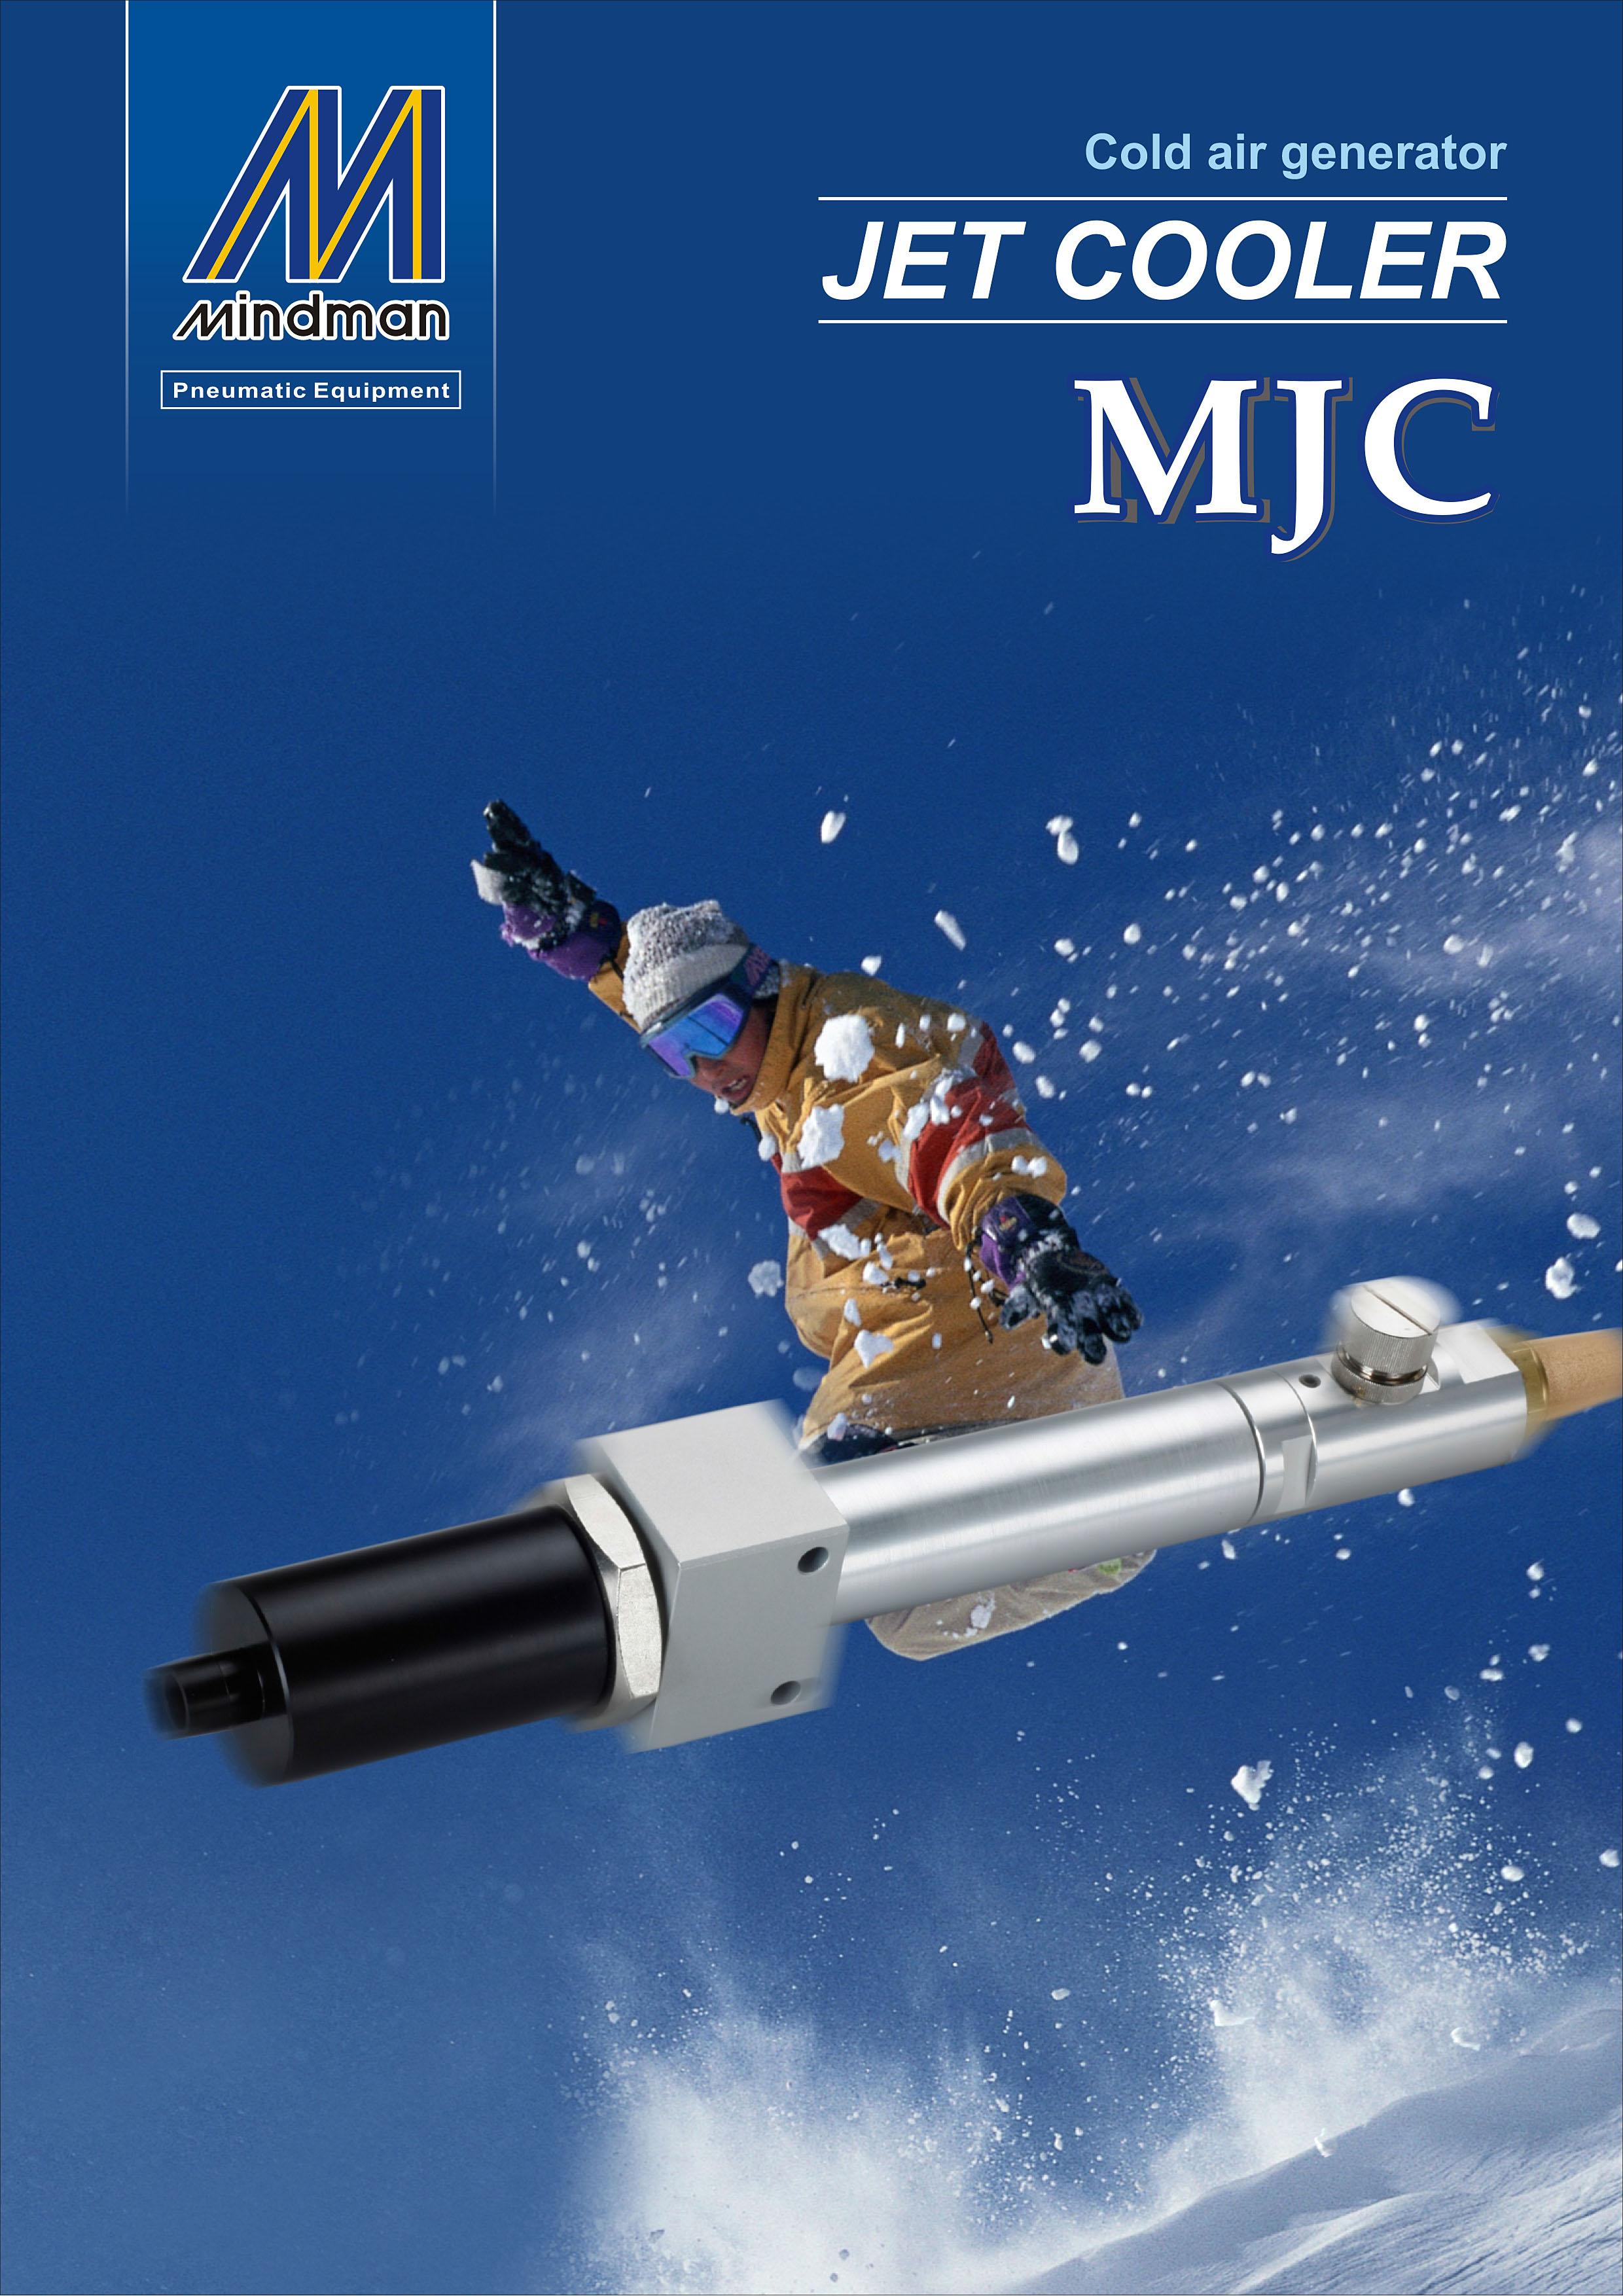 Jet cooler MJC